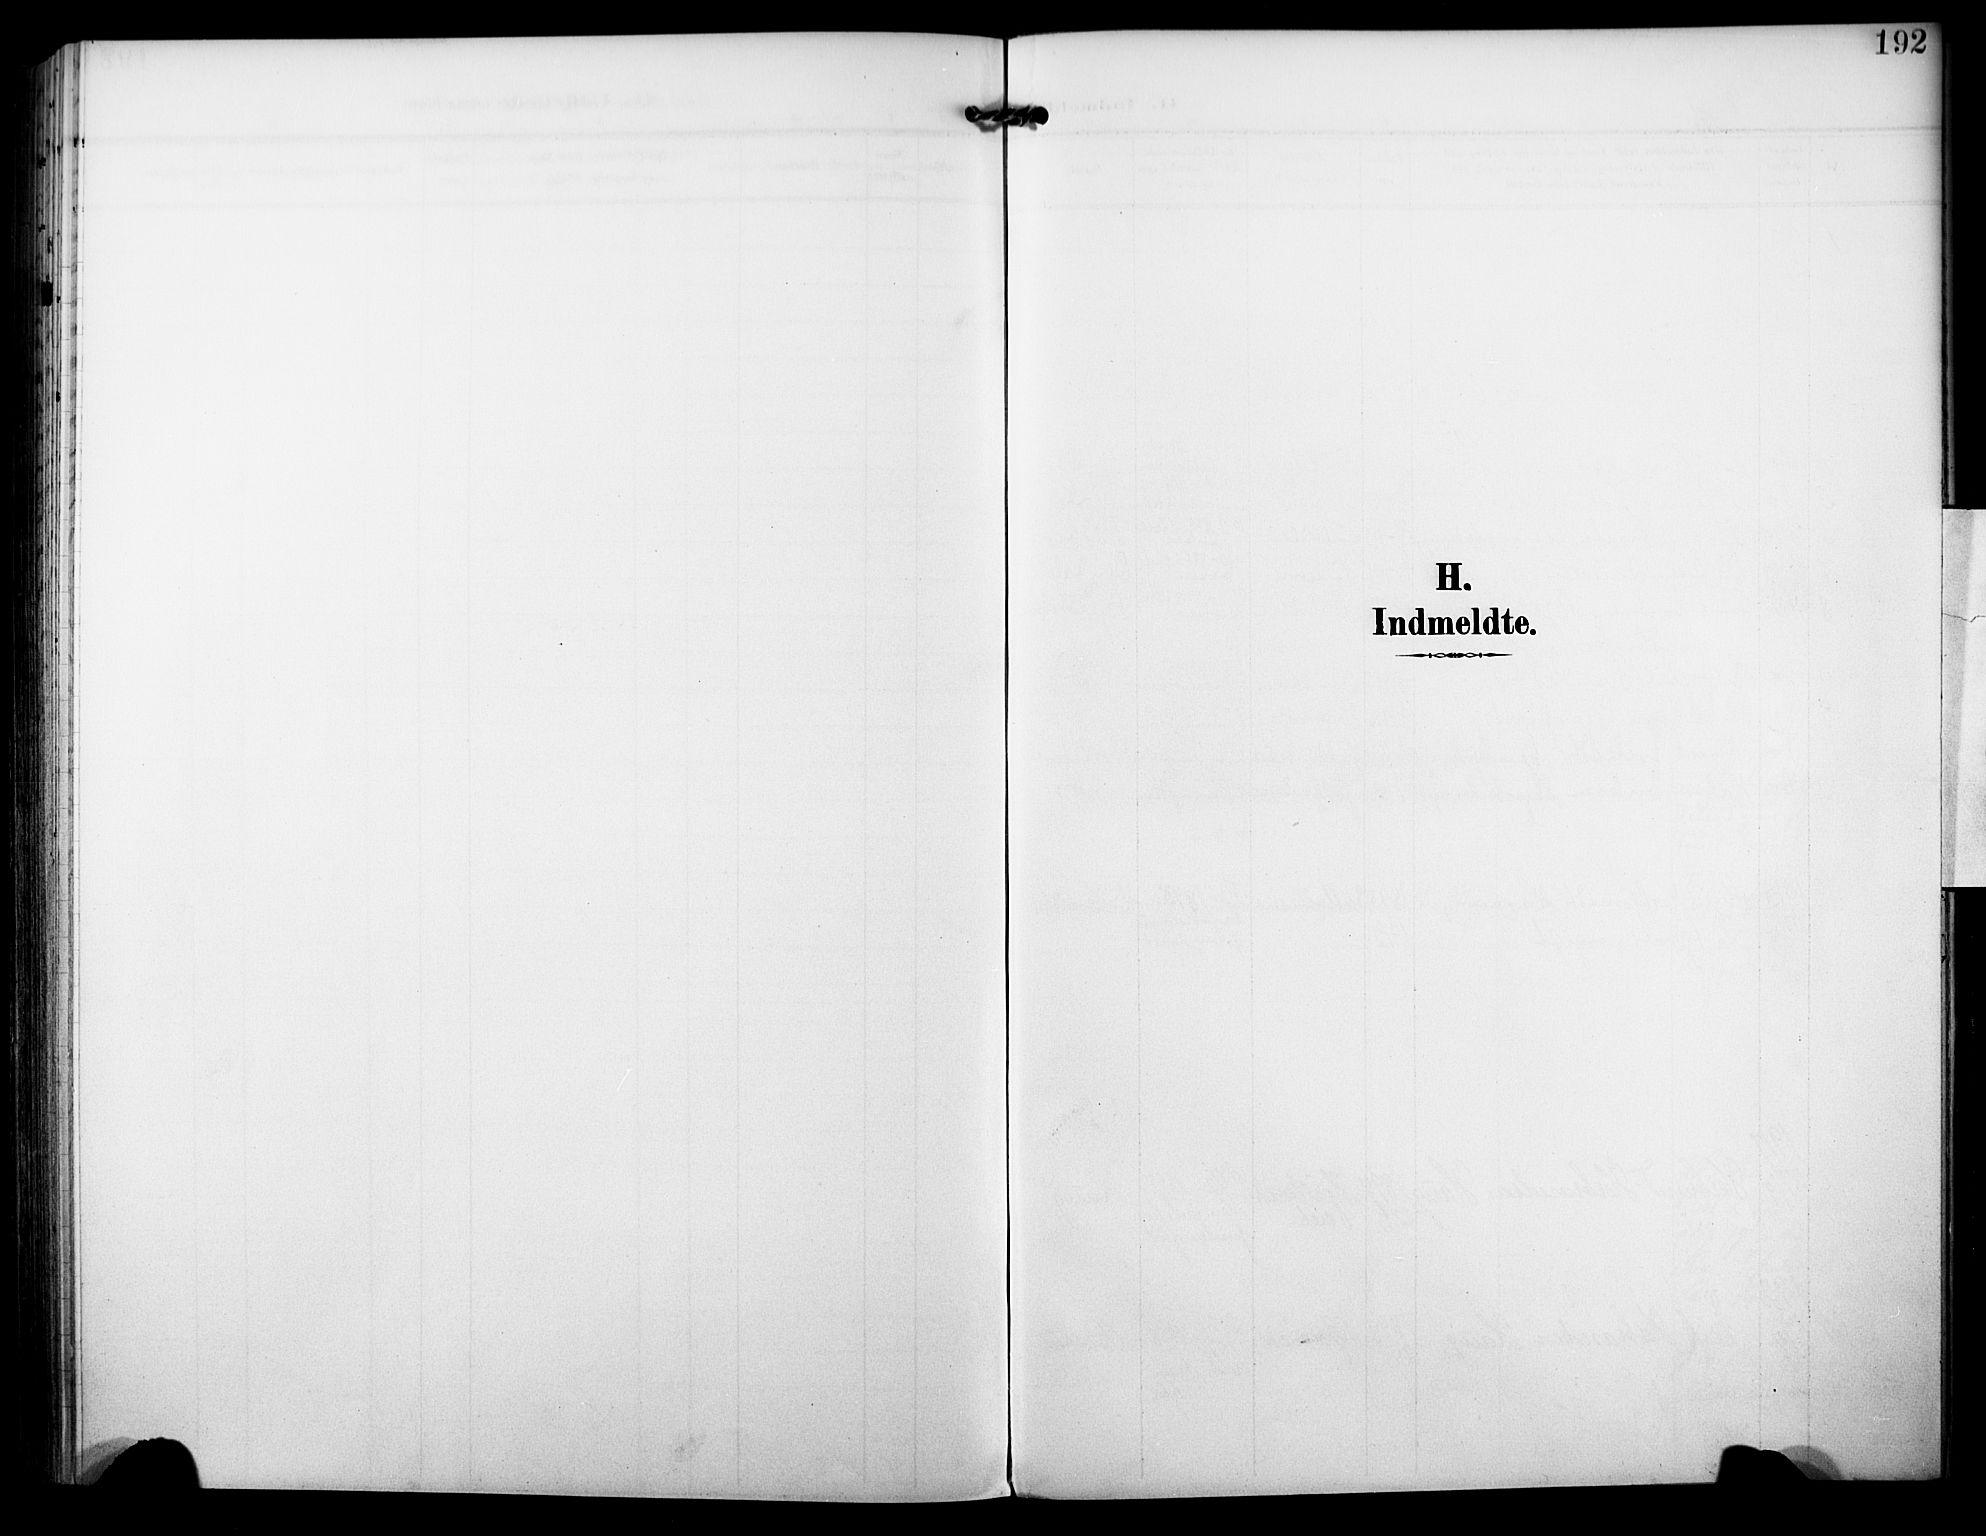 SAKO, Nore kirkebøker, F/Fb/L0003: Ministerialbok nr. II 3, 1906-1926, s. 192